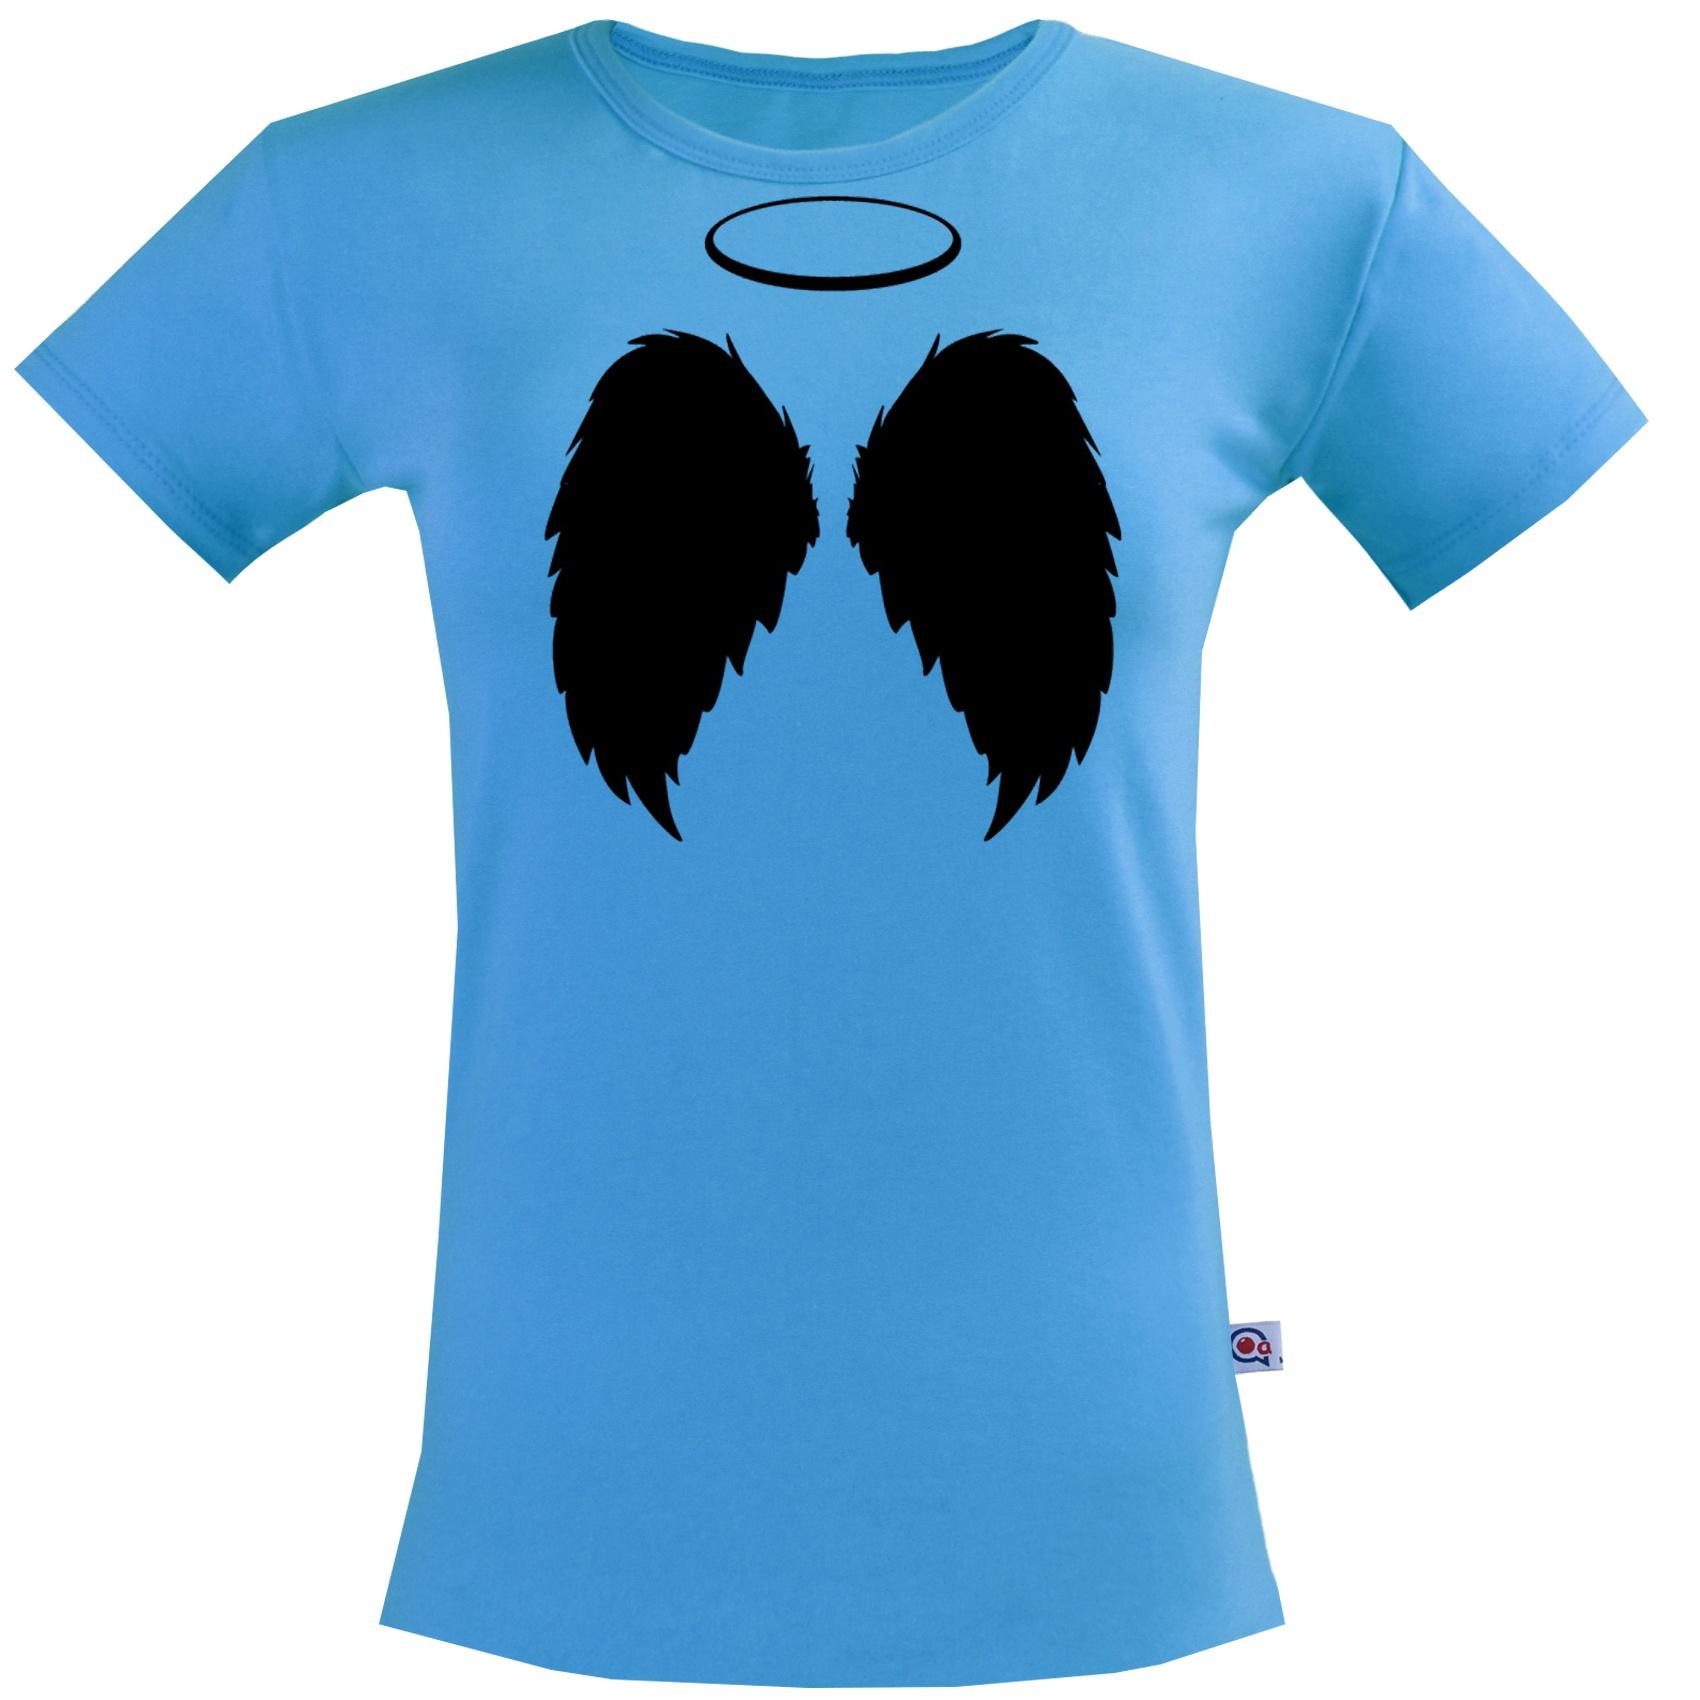 تیشرت آستین کوتاه  زنانه آکو طرح بال فرشته کد Na042